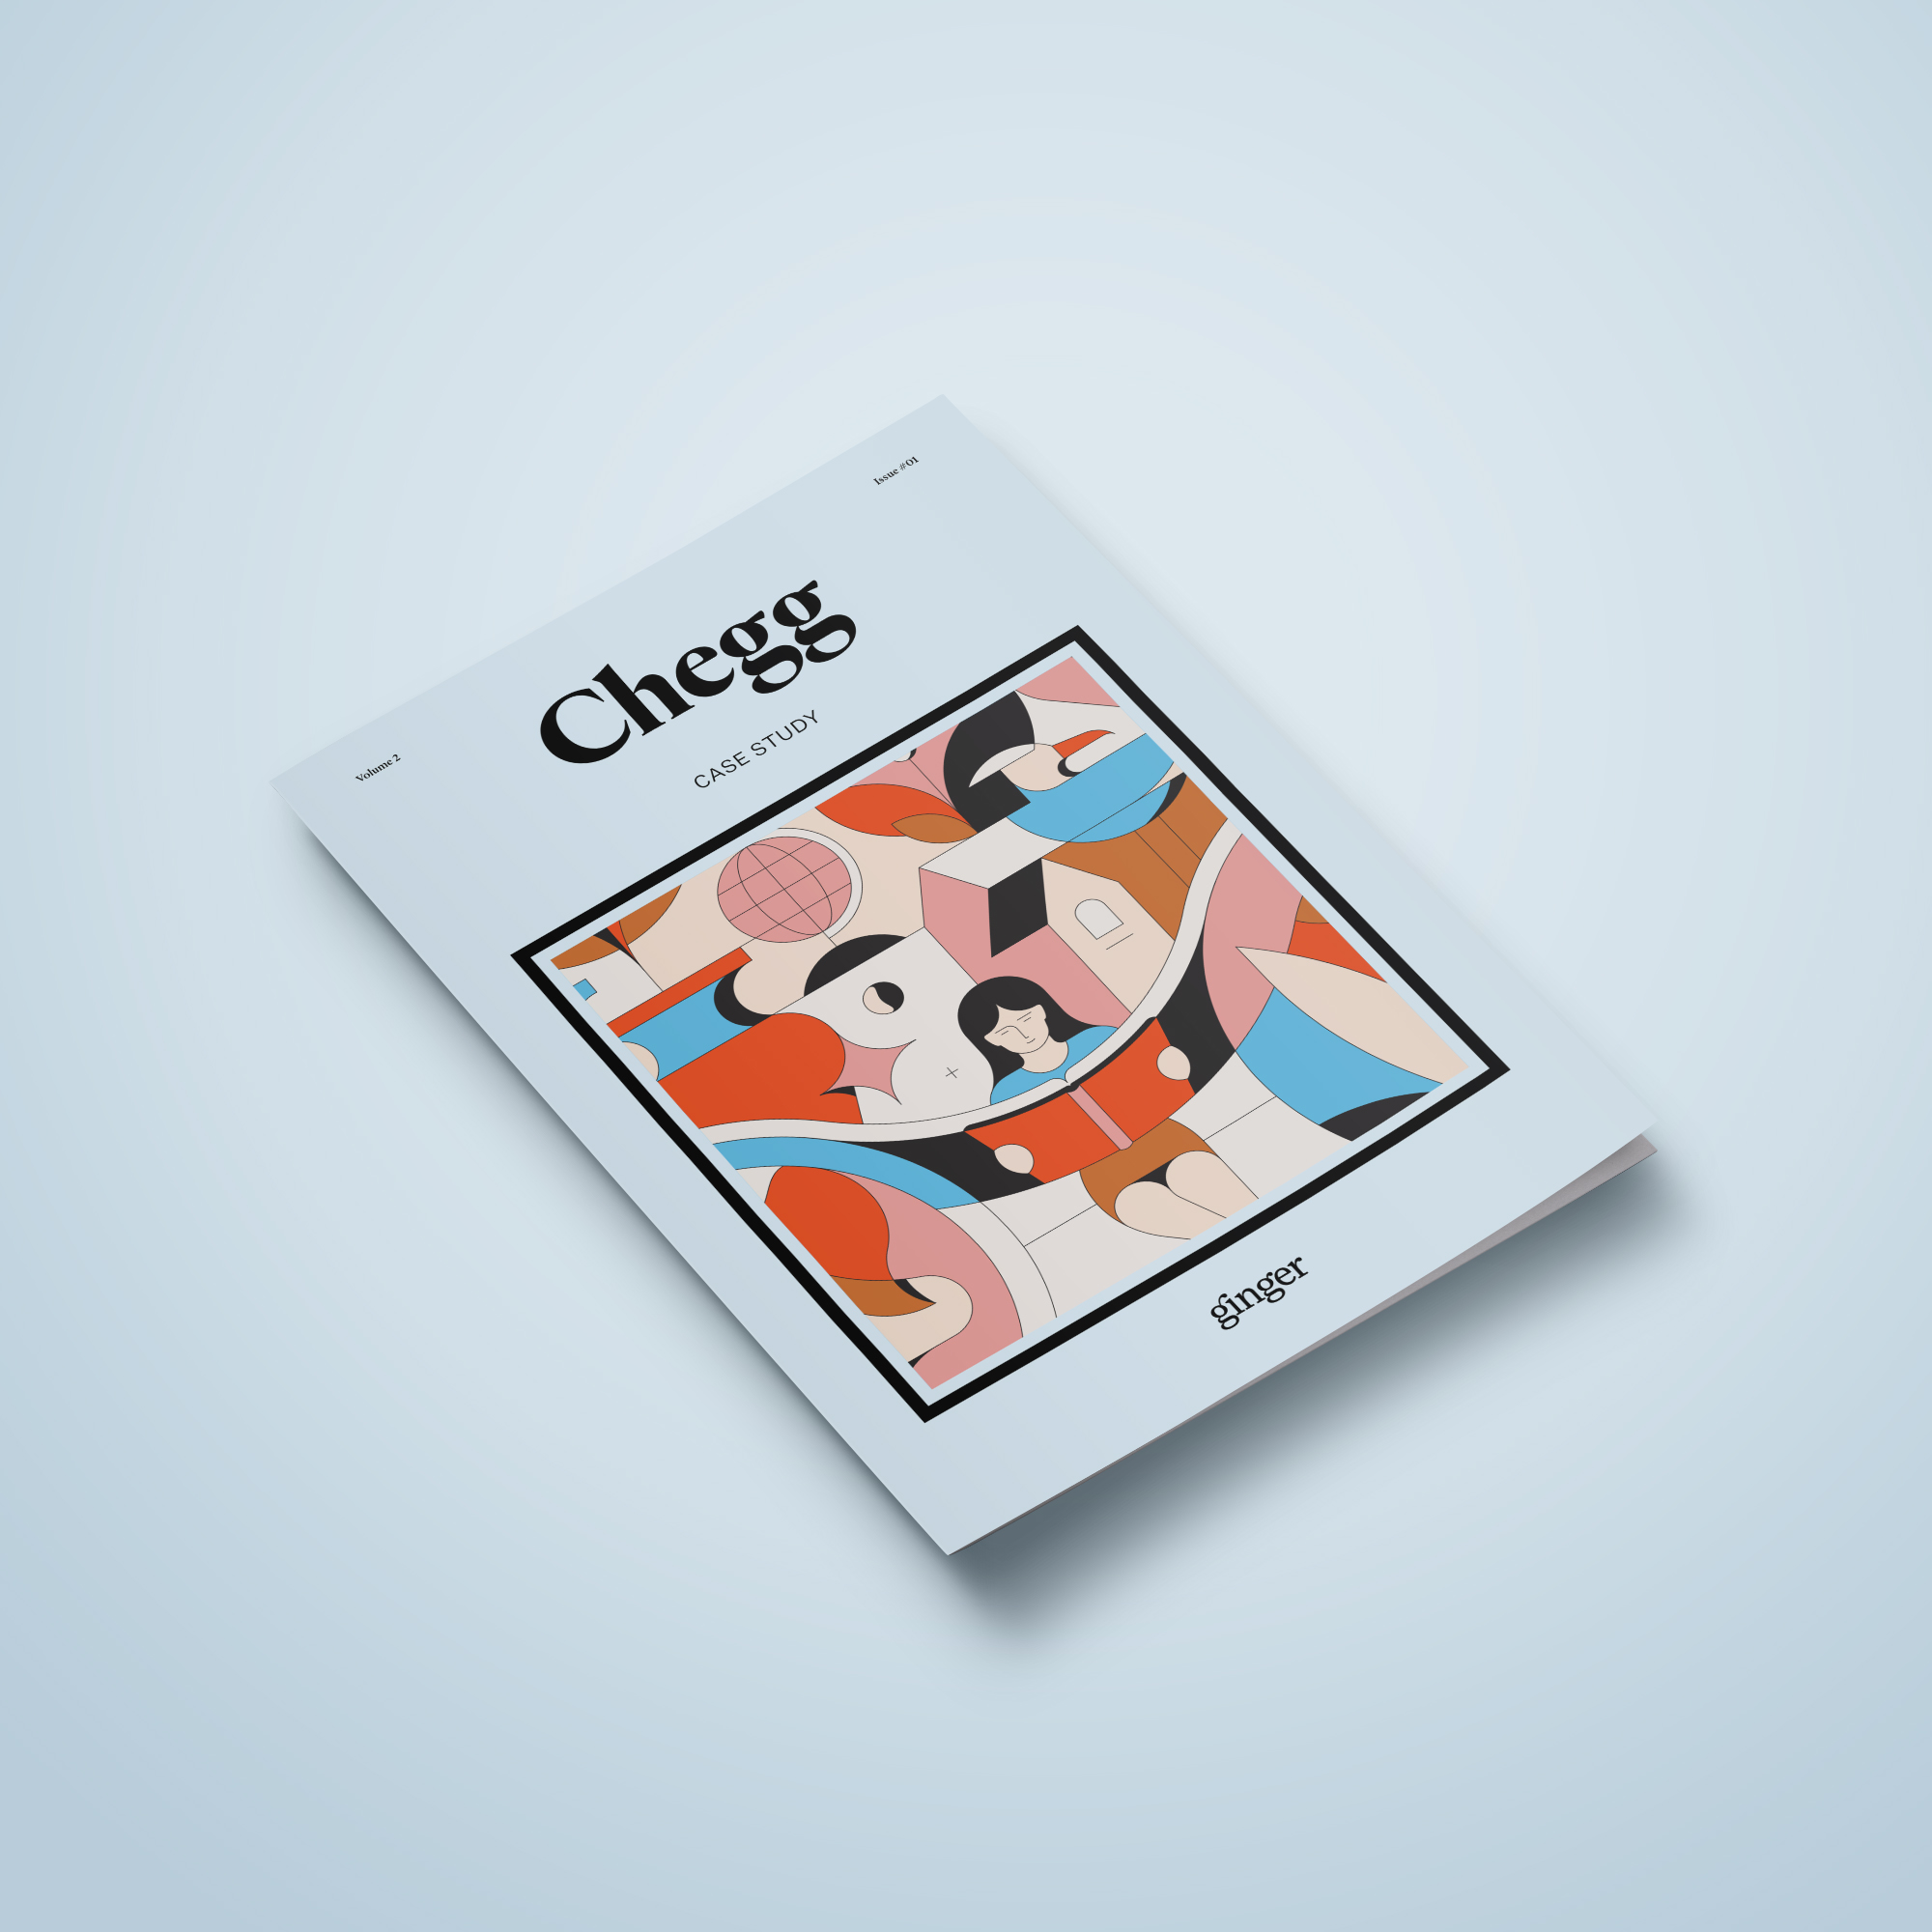 Chegg_Mockup